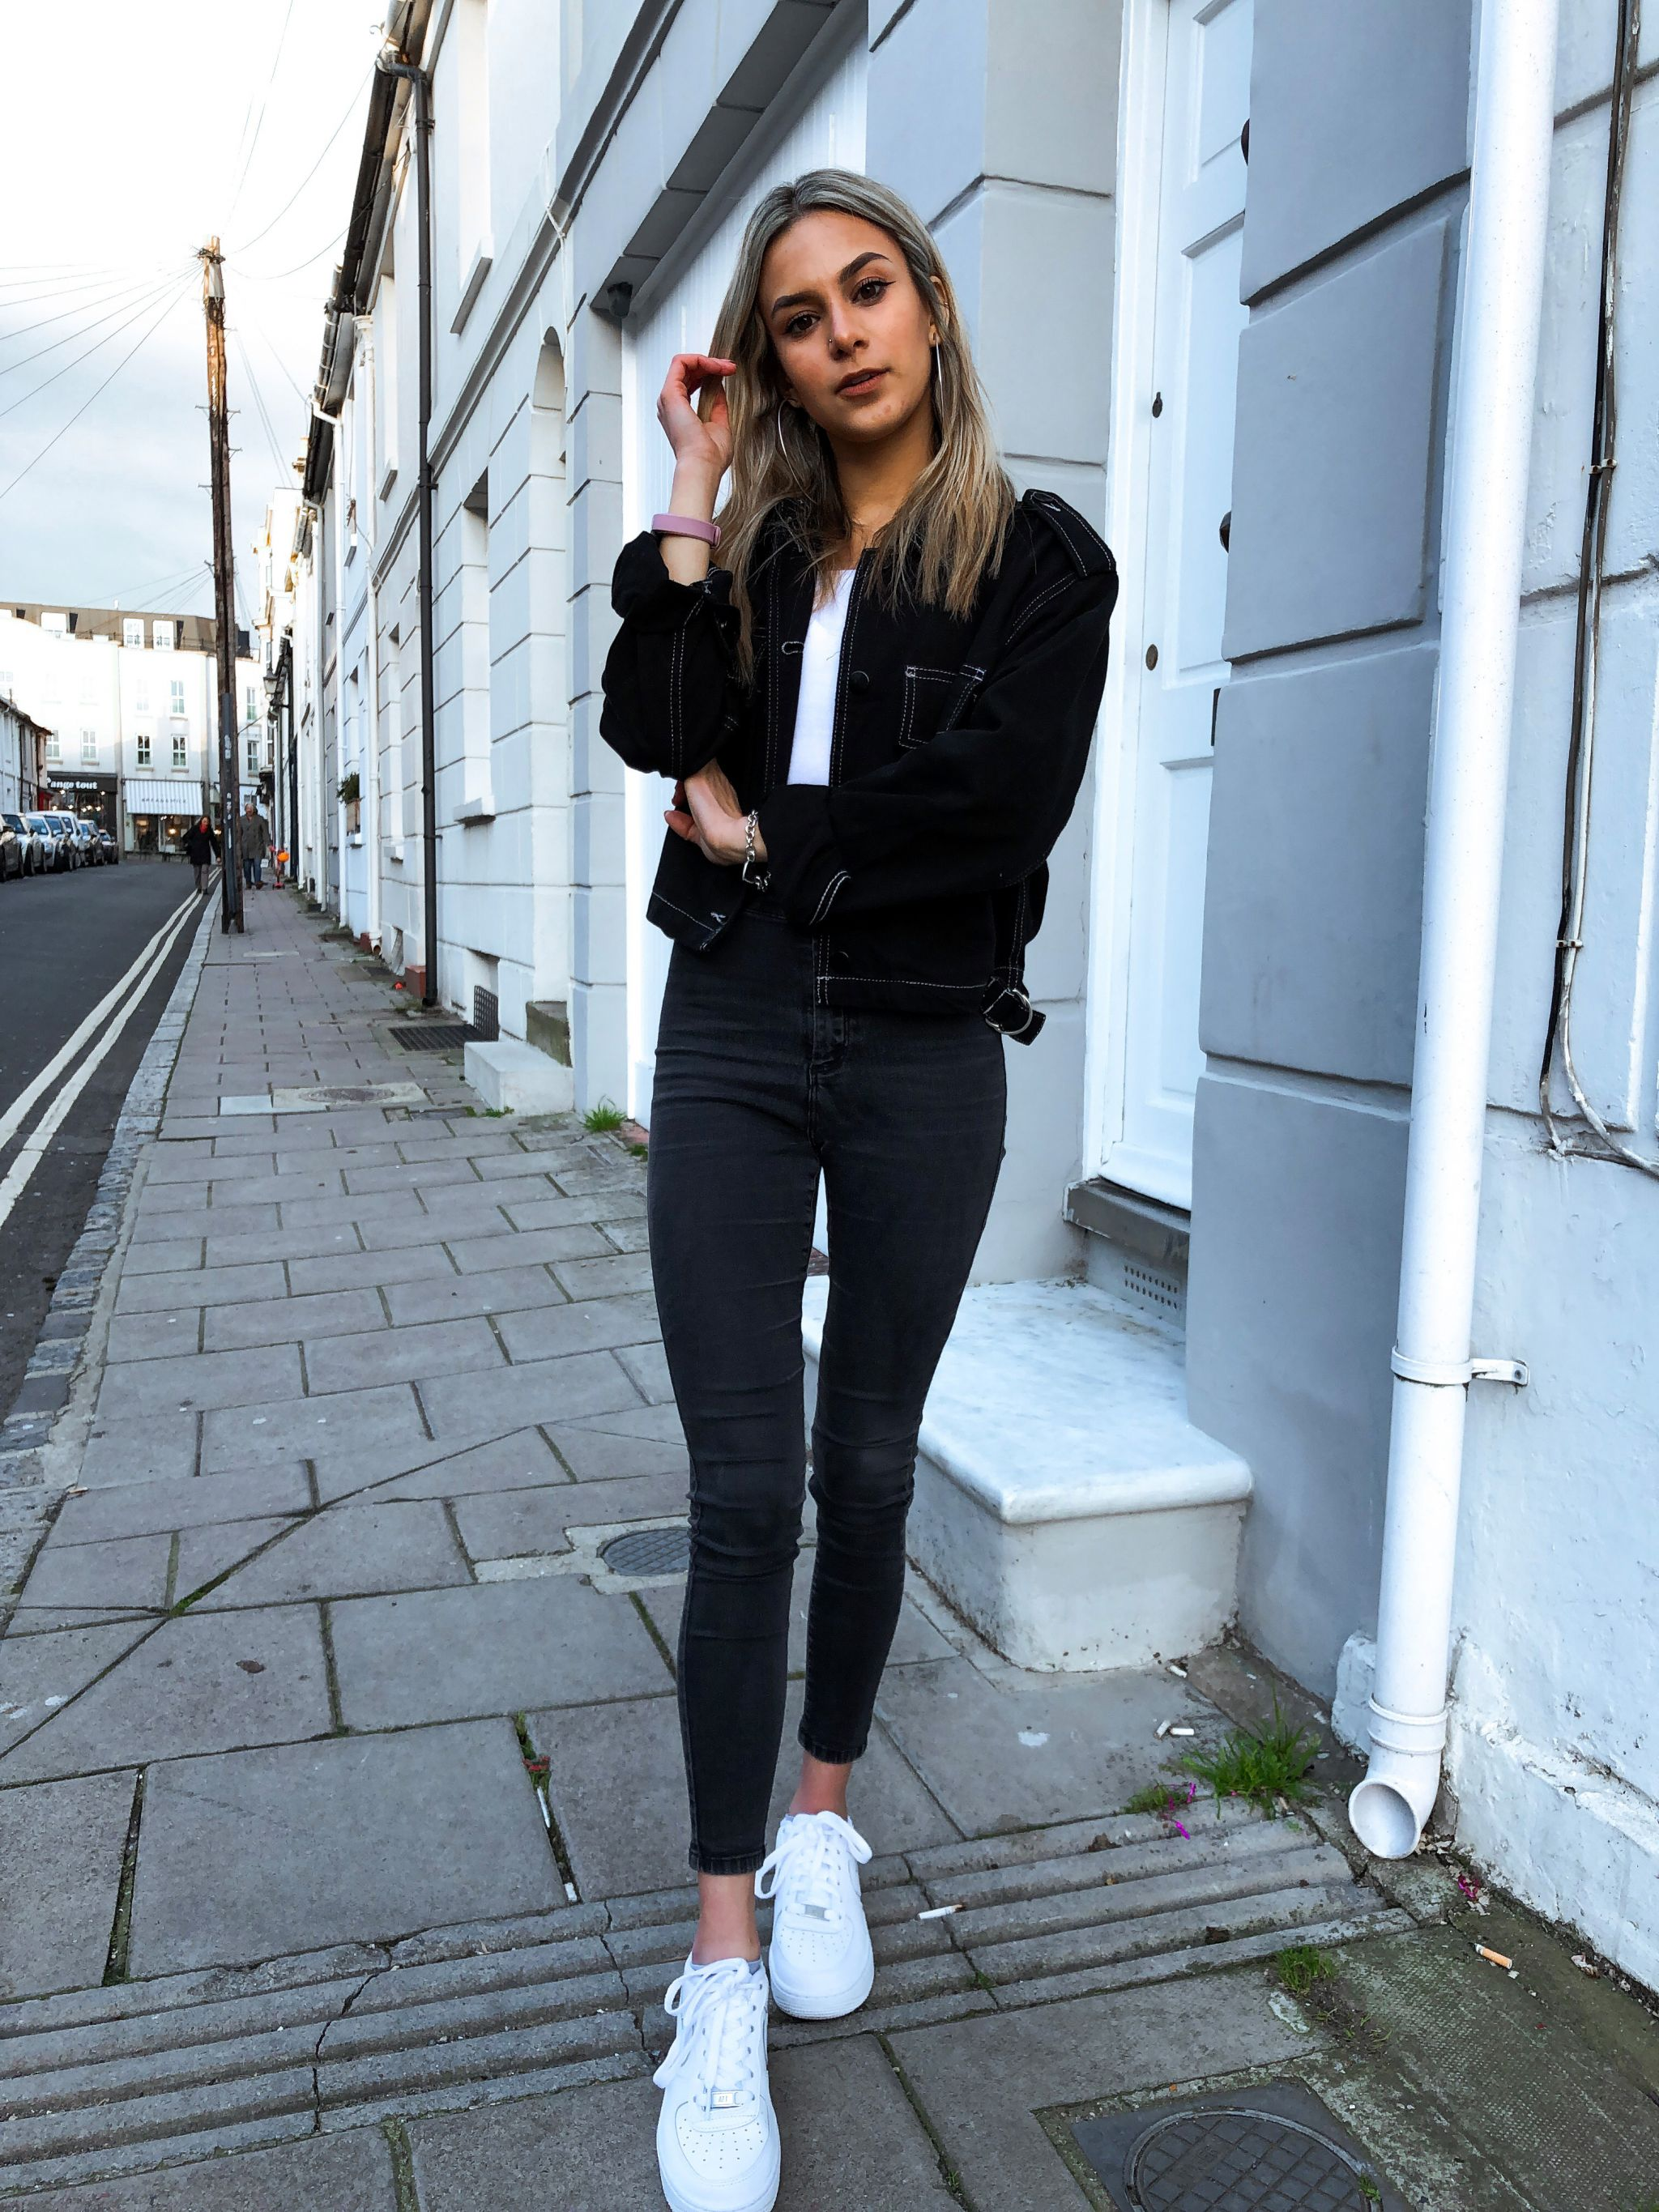 yasmin stefanie brighton street style topshop black denim joni jeans australian open hopman cup roger federer